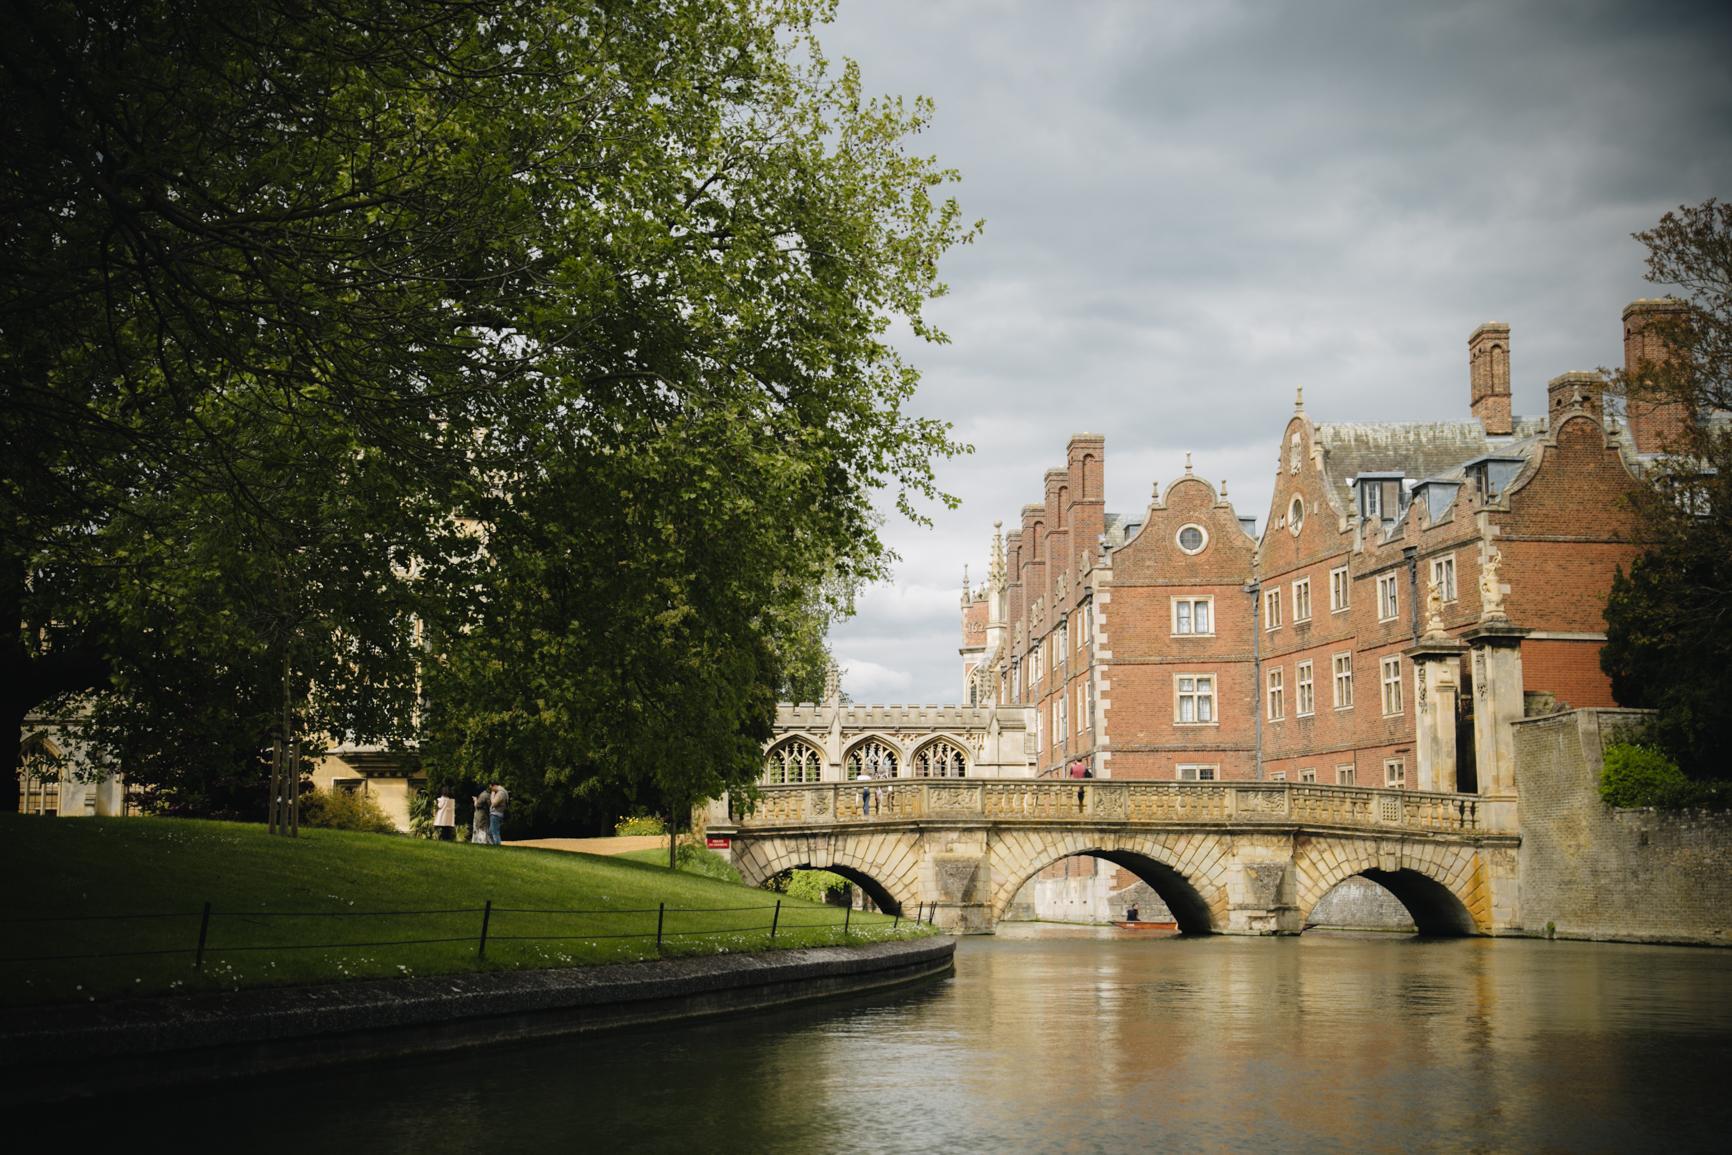 Punting-in-Cambridge-bridge-university.jpg